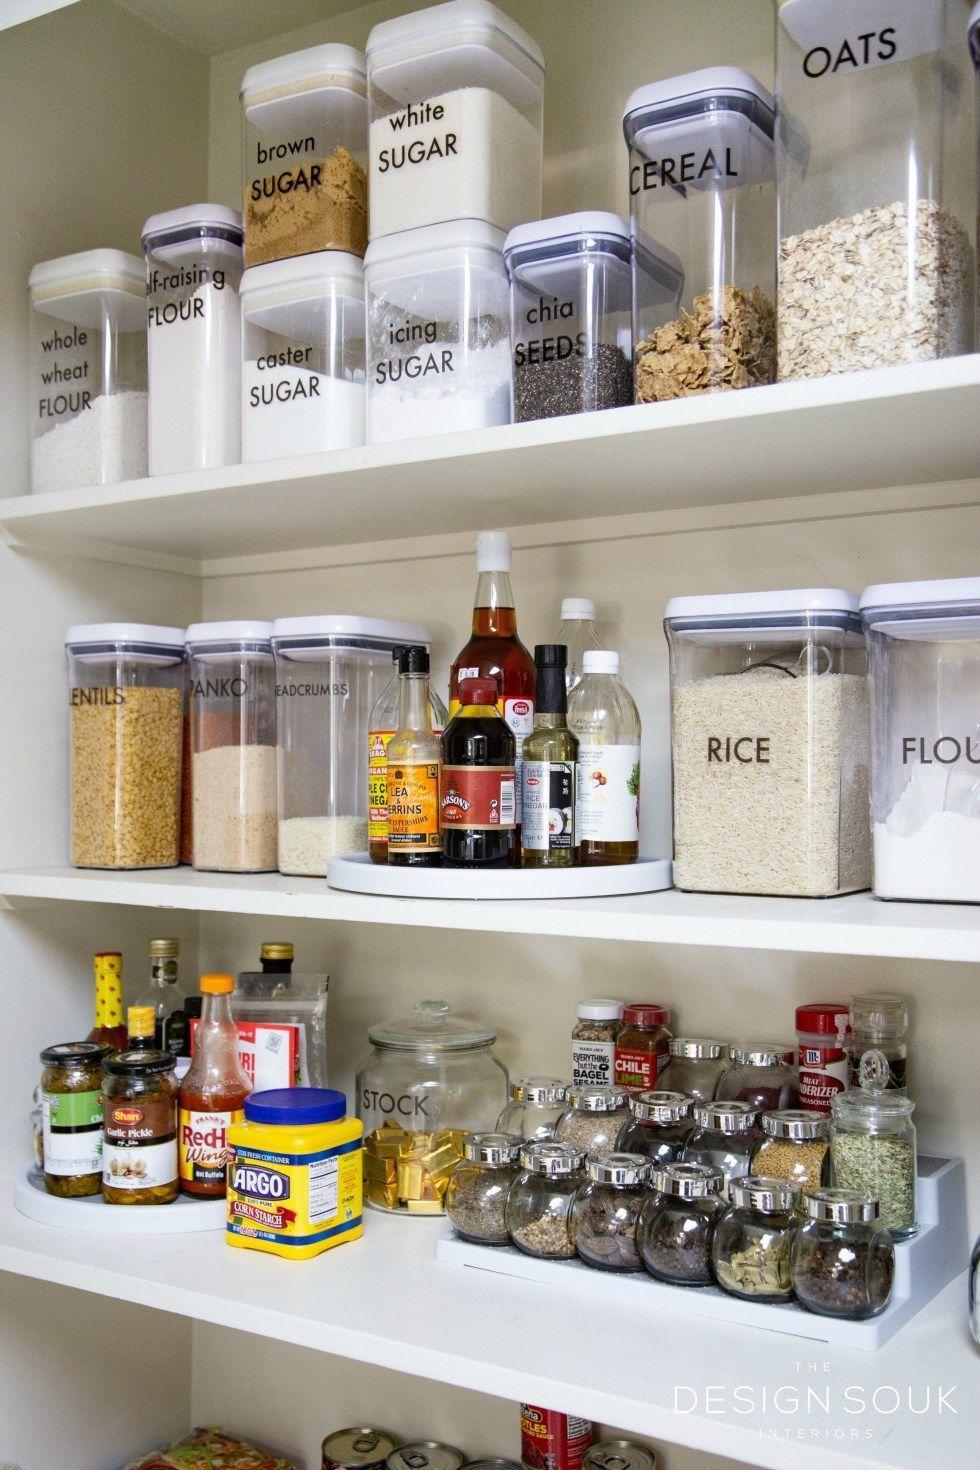 How I Organized My Pantry And My Favorite Storage Tools The Design Souk Tool Storage Storage Kitchen Storage Organization